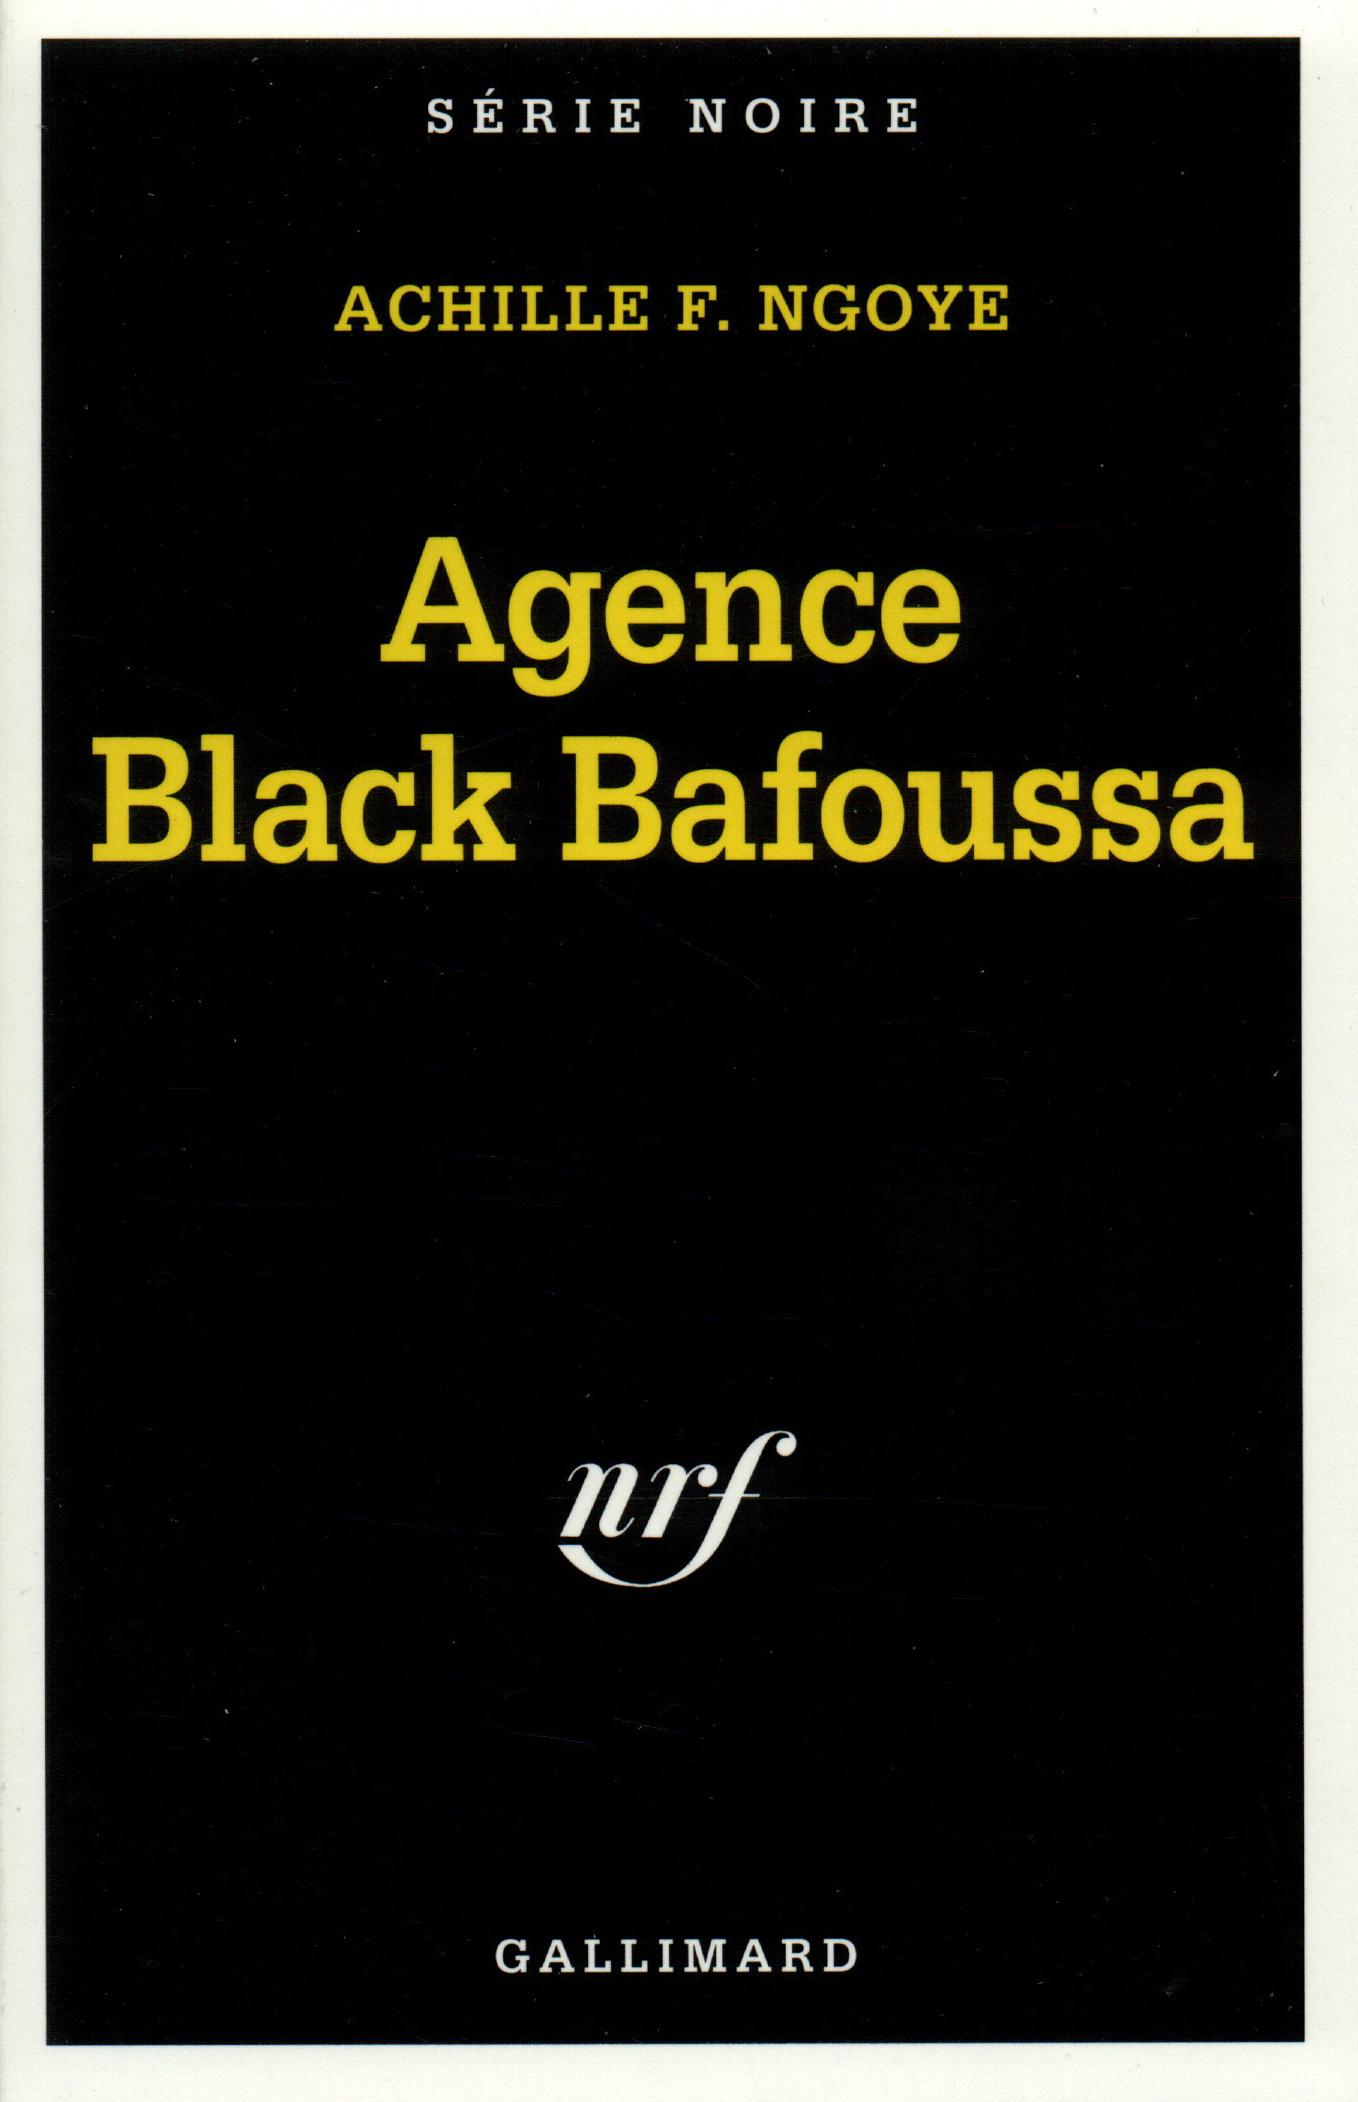 AGENCE BLACK BAFOUSSA